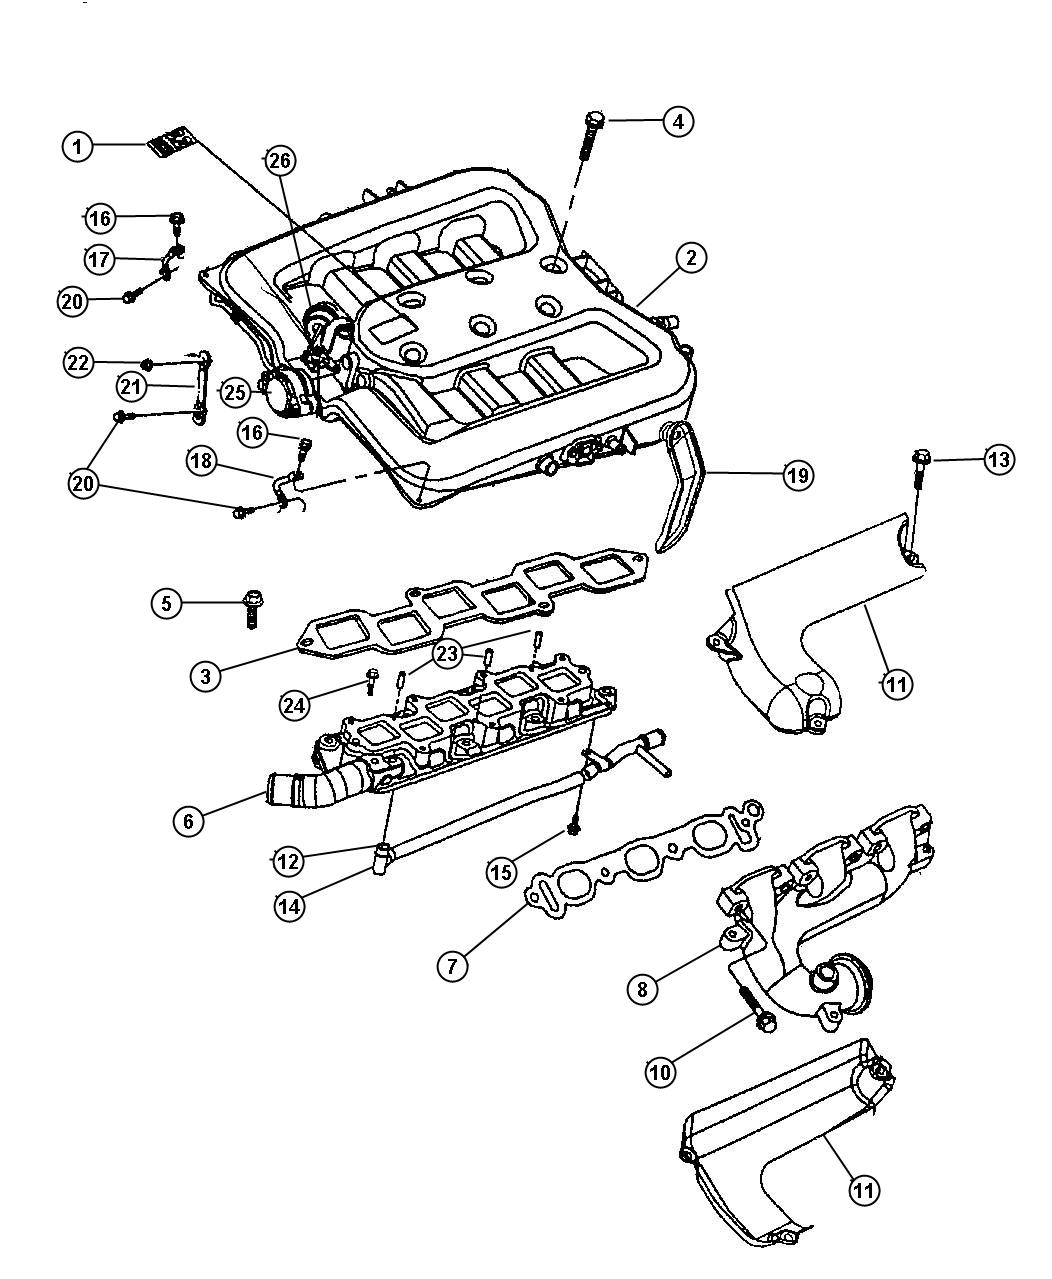 Service Manual Upper Intake Chrysler Lhs Replacement